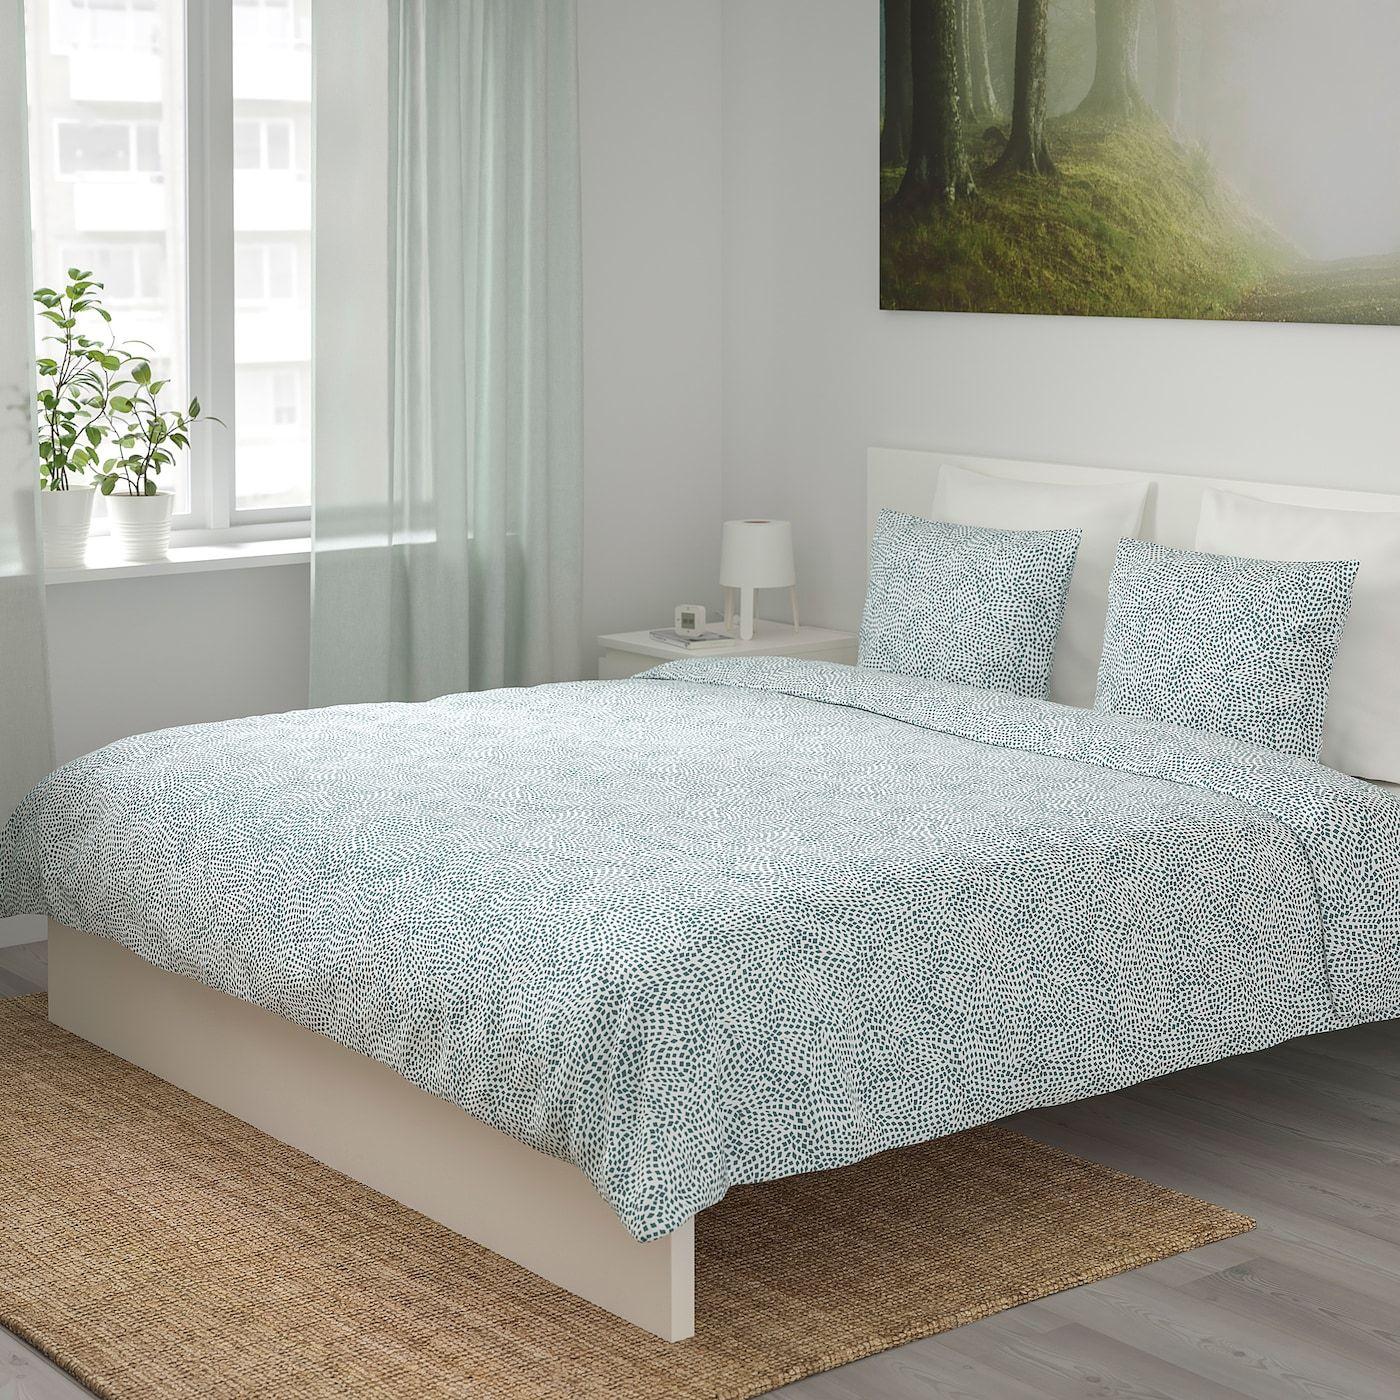 Tradkrassula Duvet Cover And Pillowcase S White Blue Shop Ikea Ikea In 2020 Duvet Covers Duvet Paisley Duvet